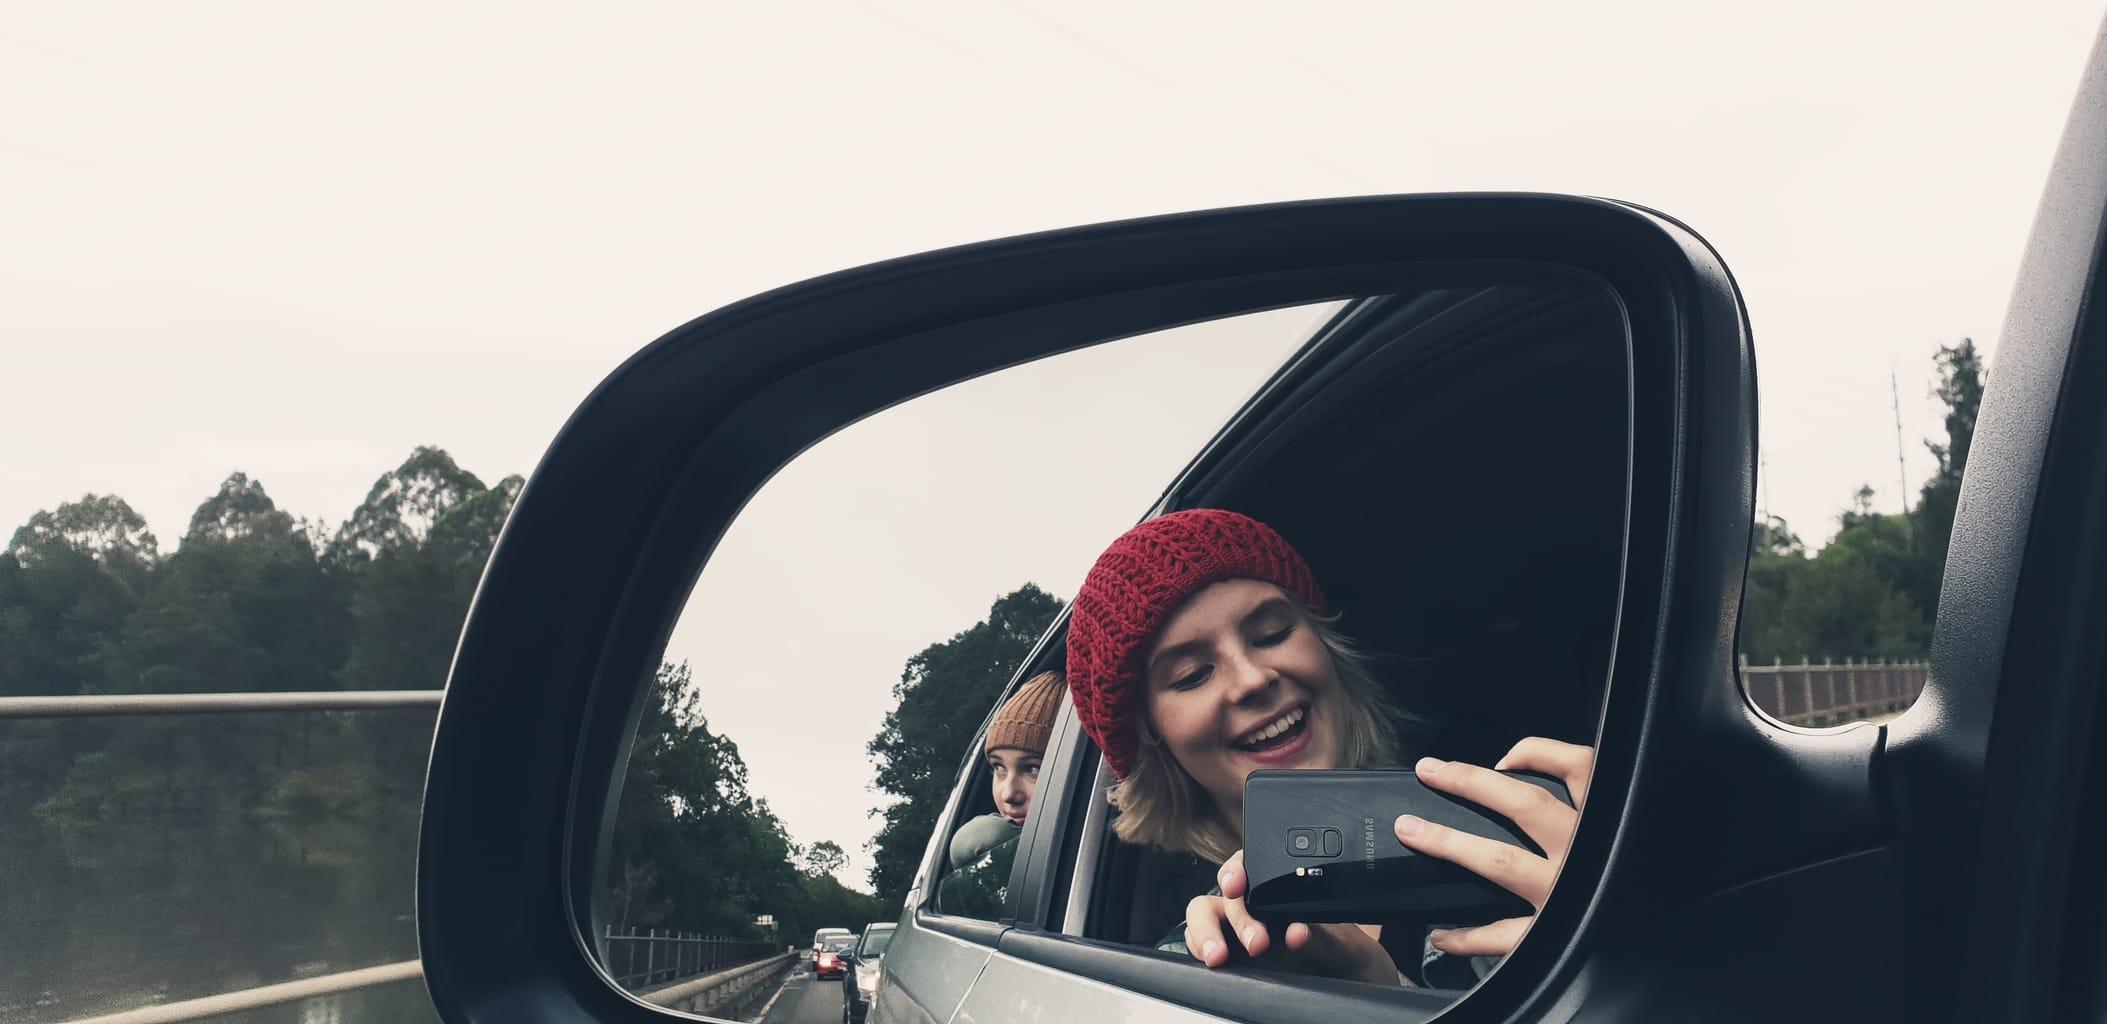 Chicas en retrovisor de coche con Galaxy S9